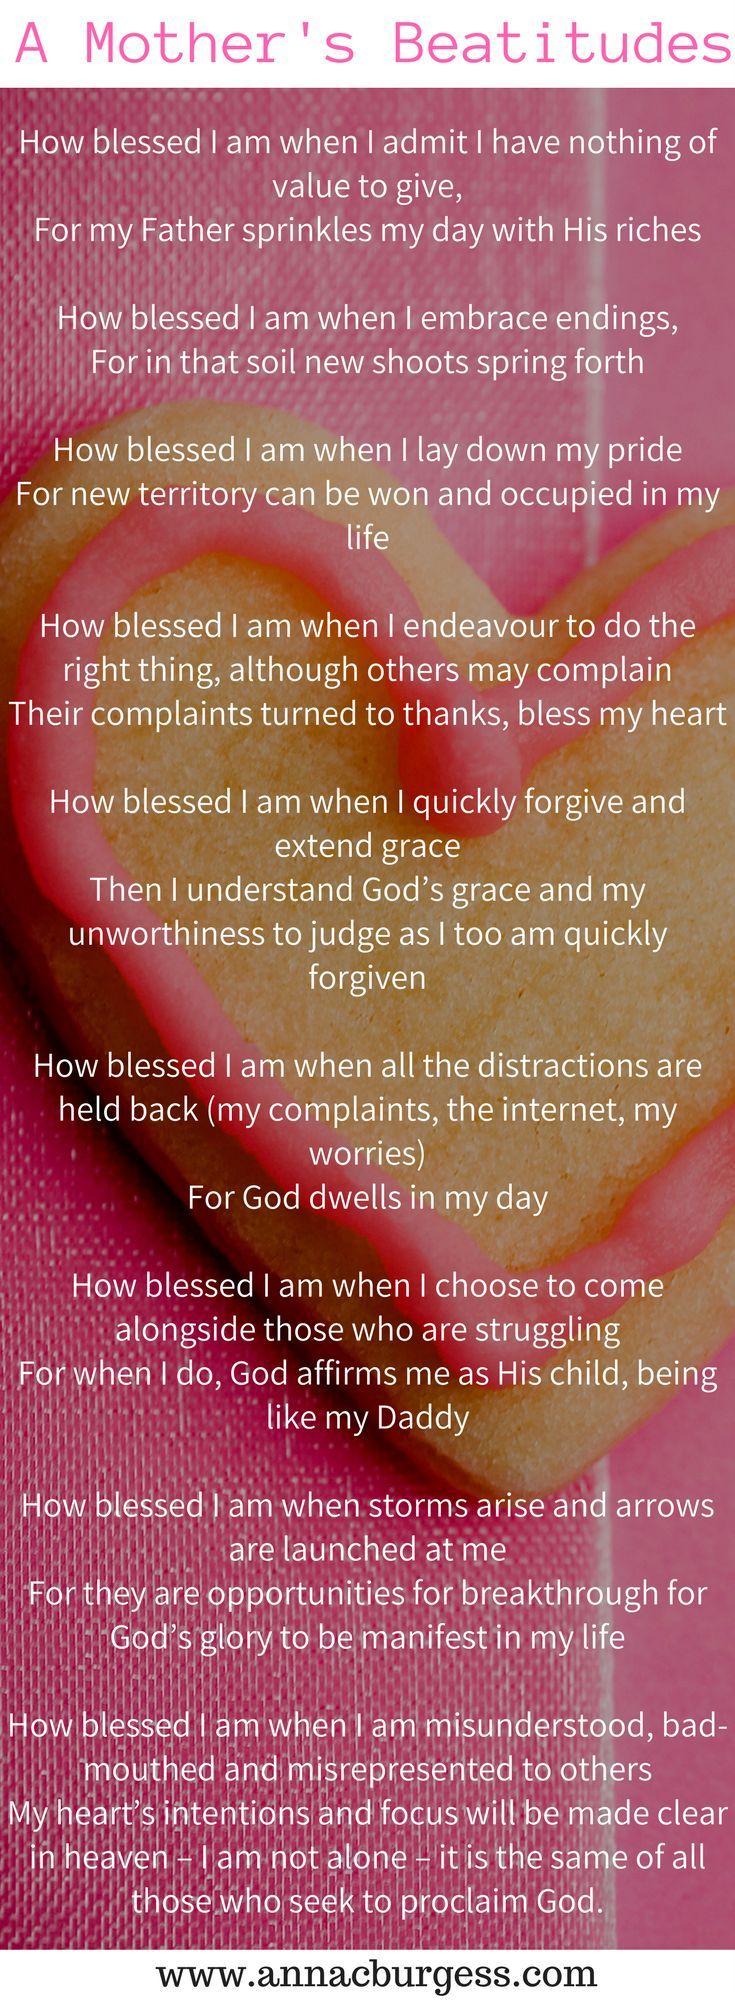 Applying the beatitudes to life as a mother. #blessings #prayersformoms #motherhoodprayers #lovemotherhood #keepgoing  https://annacburgess.com/quietcorner/2012/01/how-blessed-i-am-when-i-admit-i-have.html